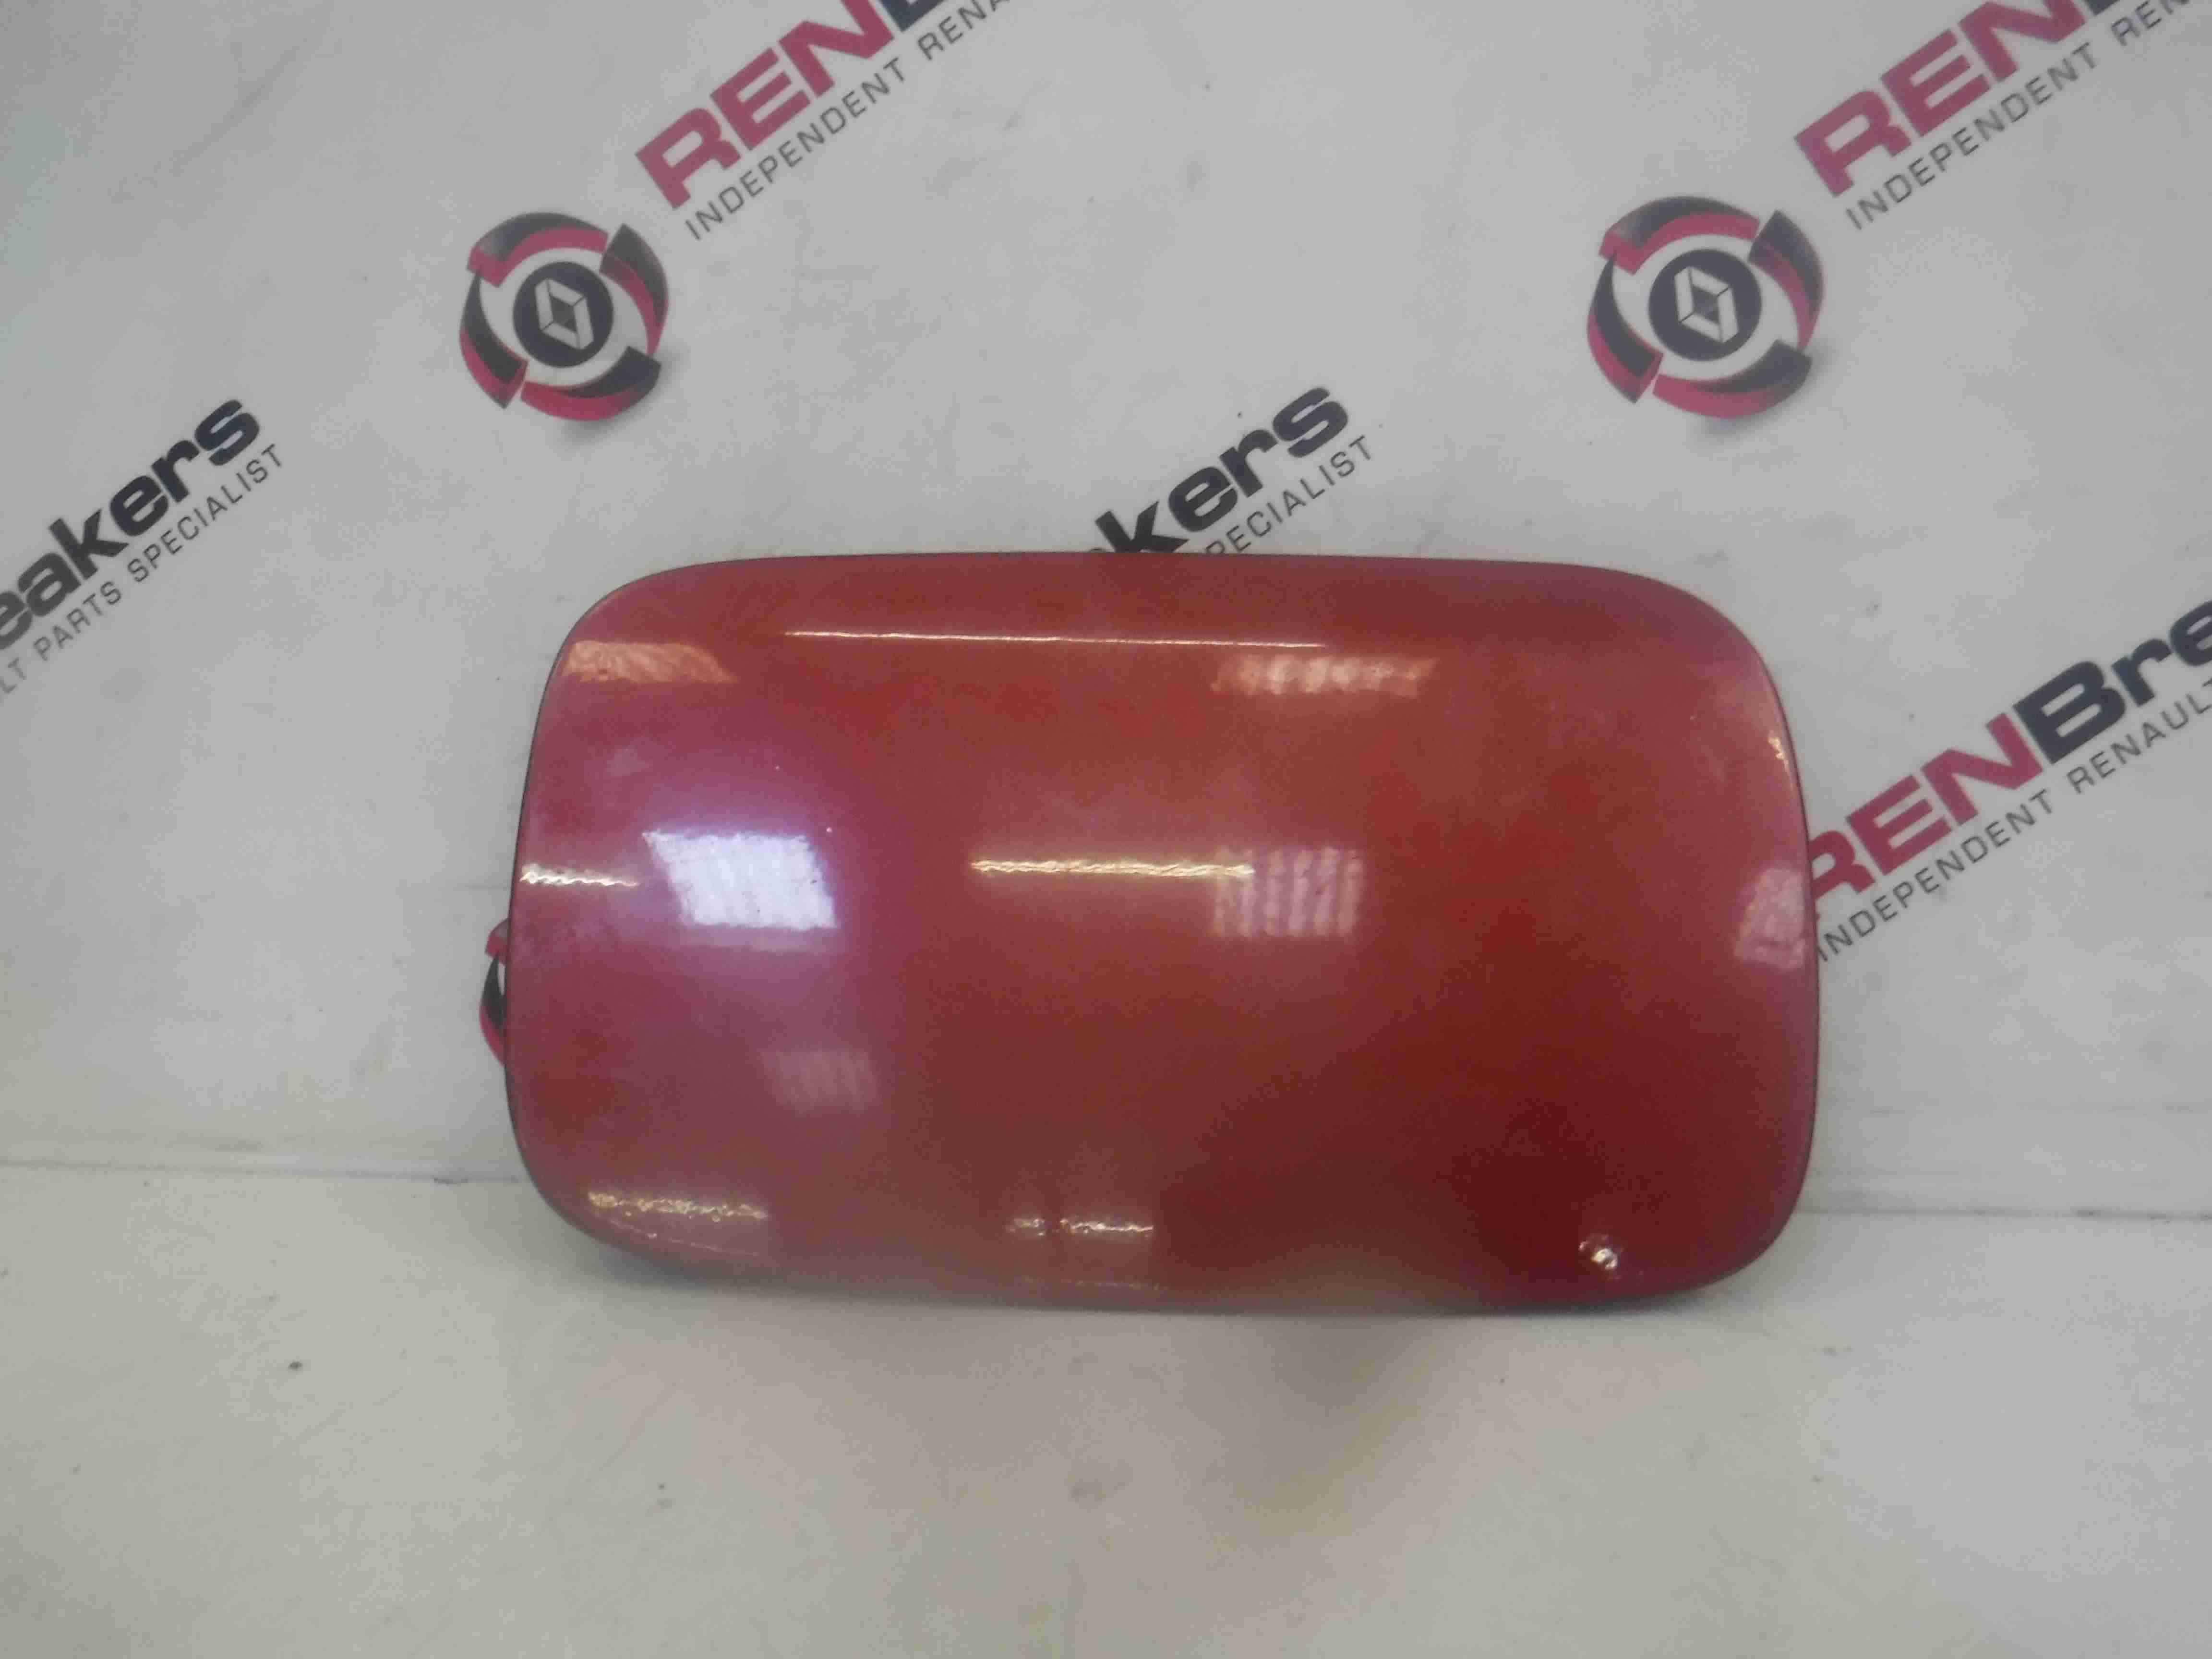 Renault Laguna Estate 2001-2005 Fuel Flap Cover Red TEB76 8200002161